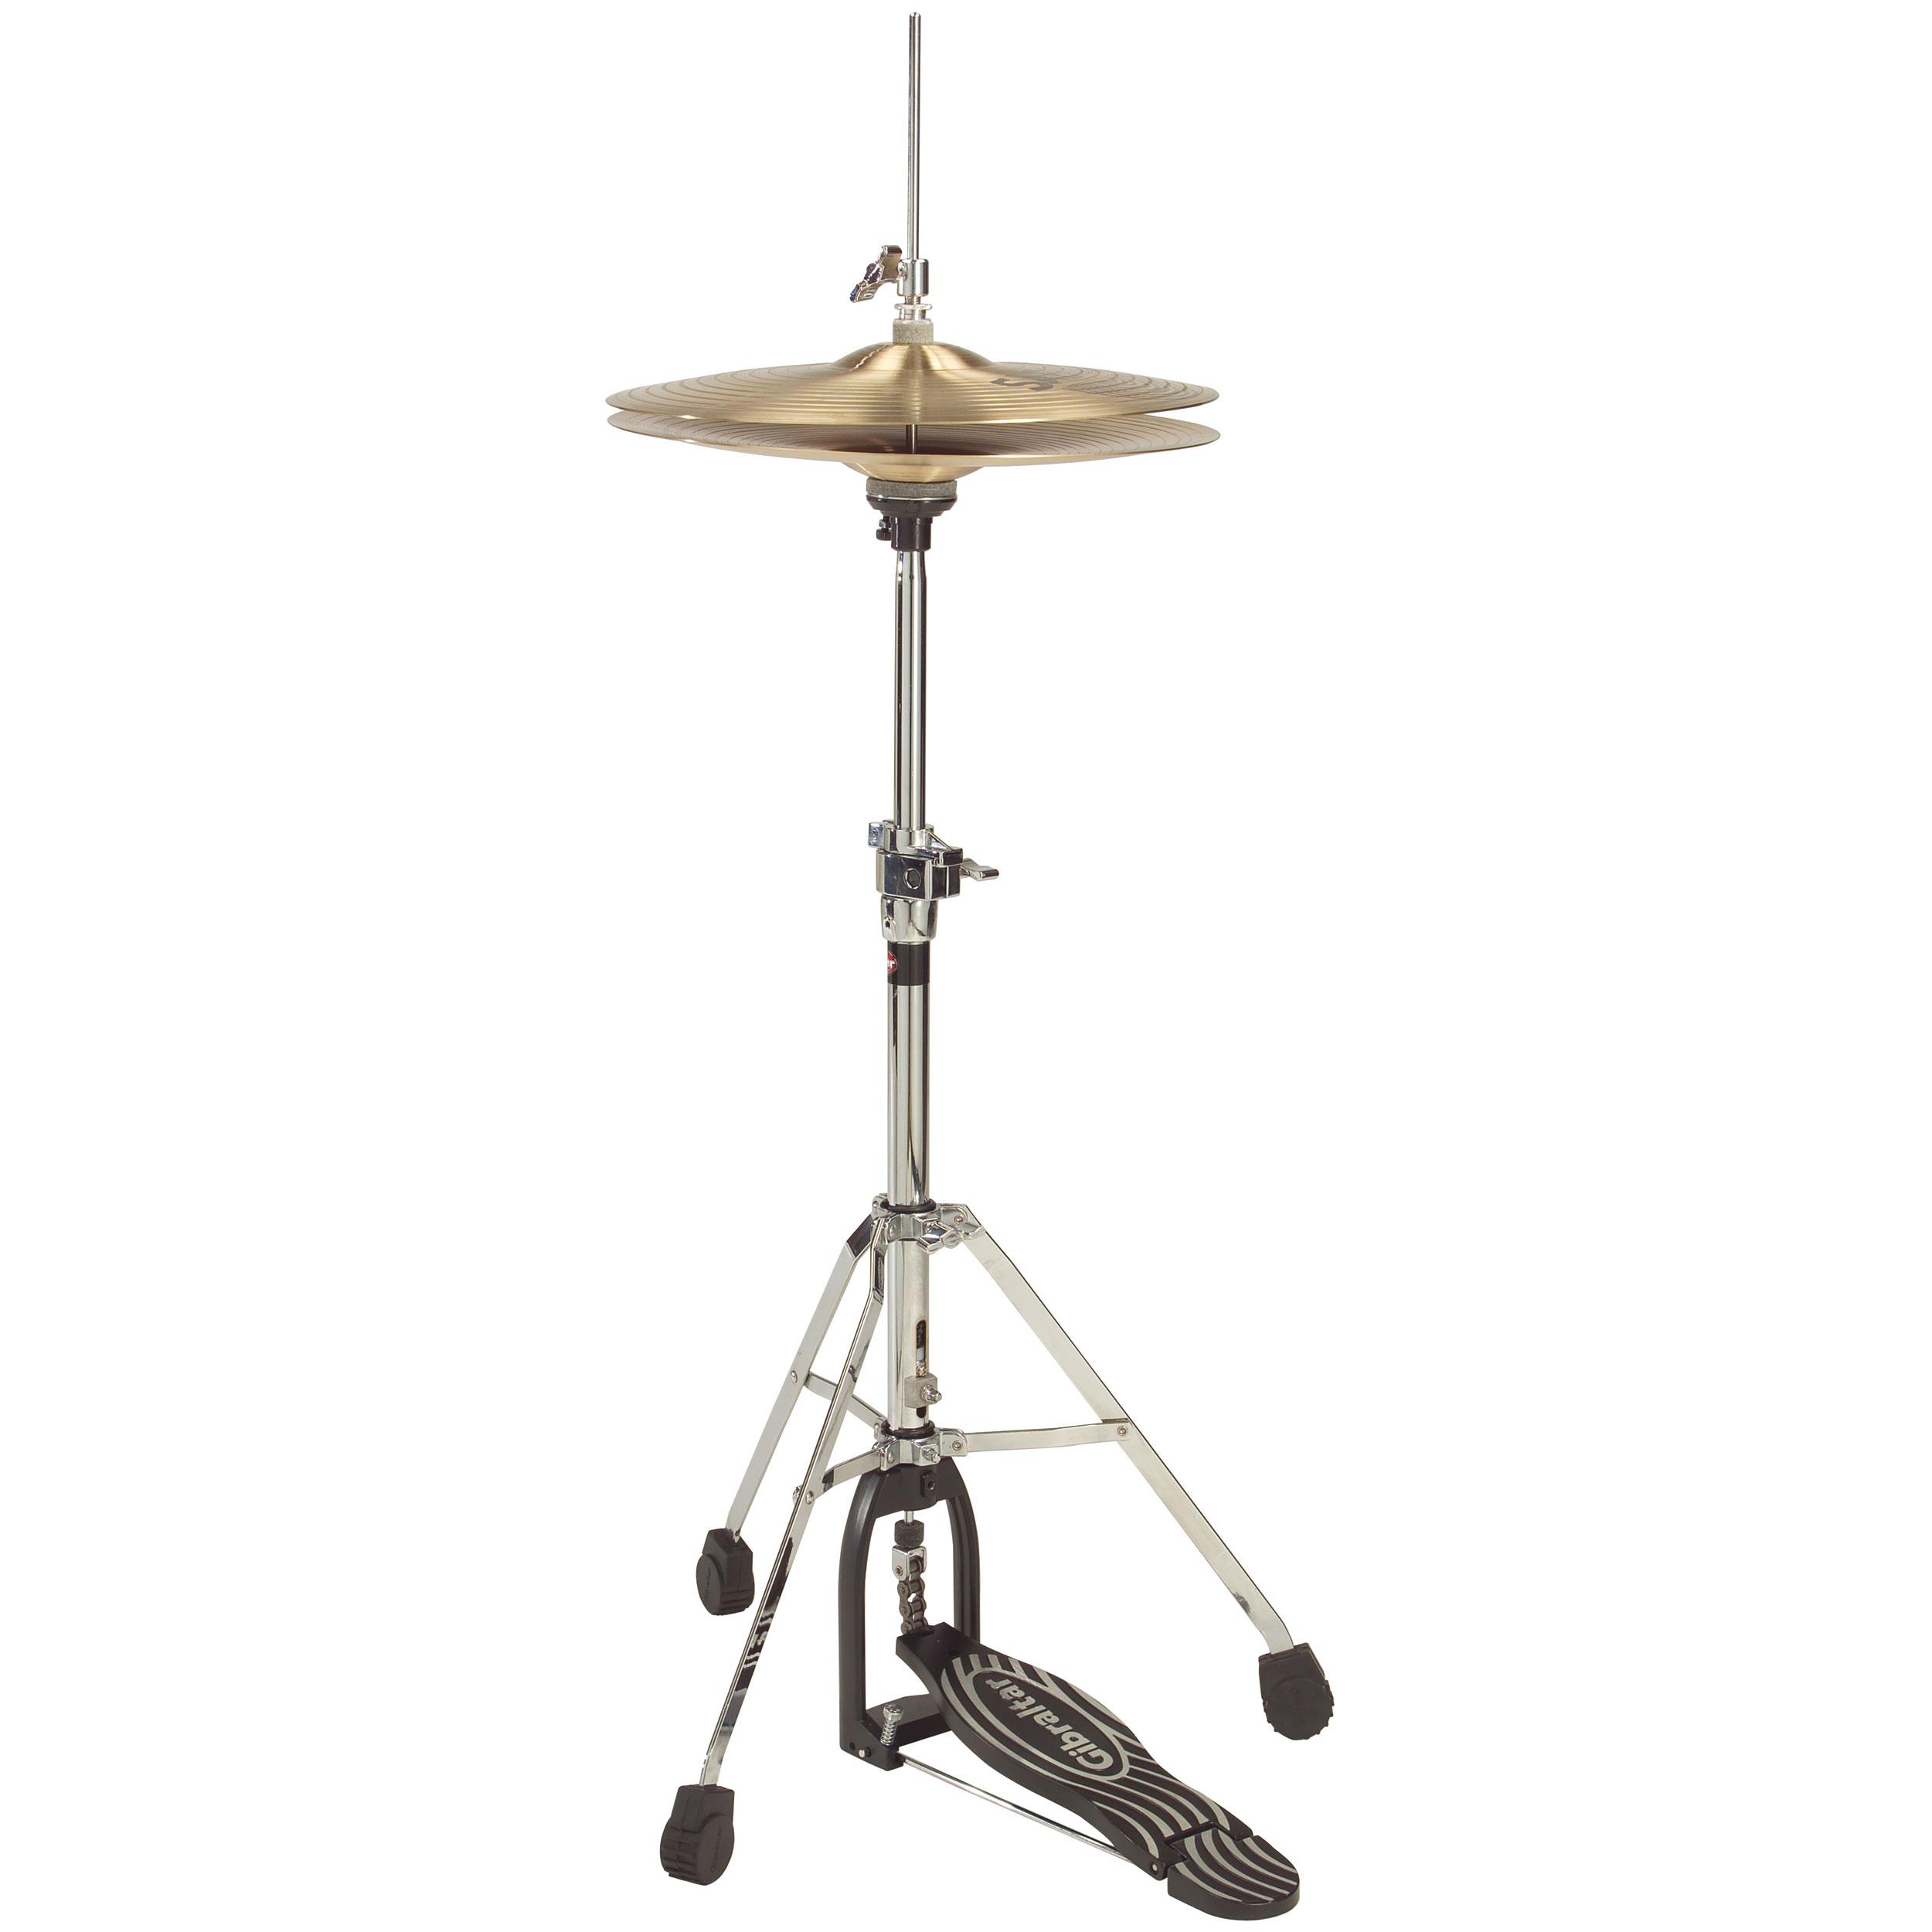 Drum Kit Explained - Eastern Suburbs School of Music